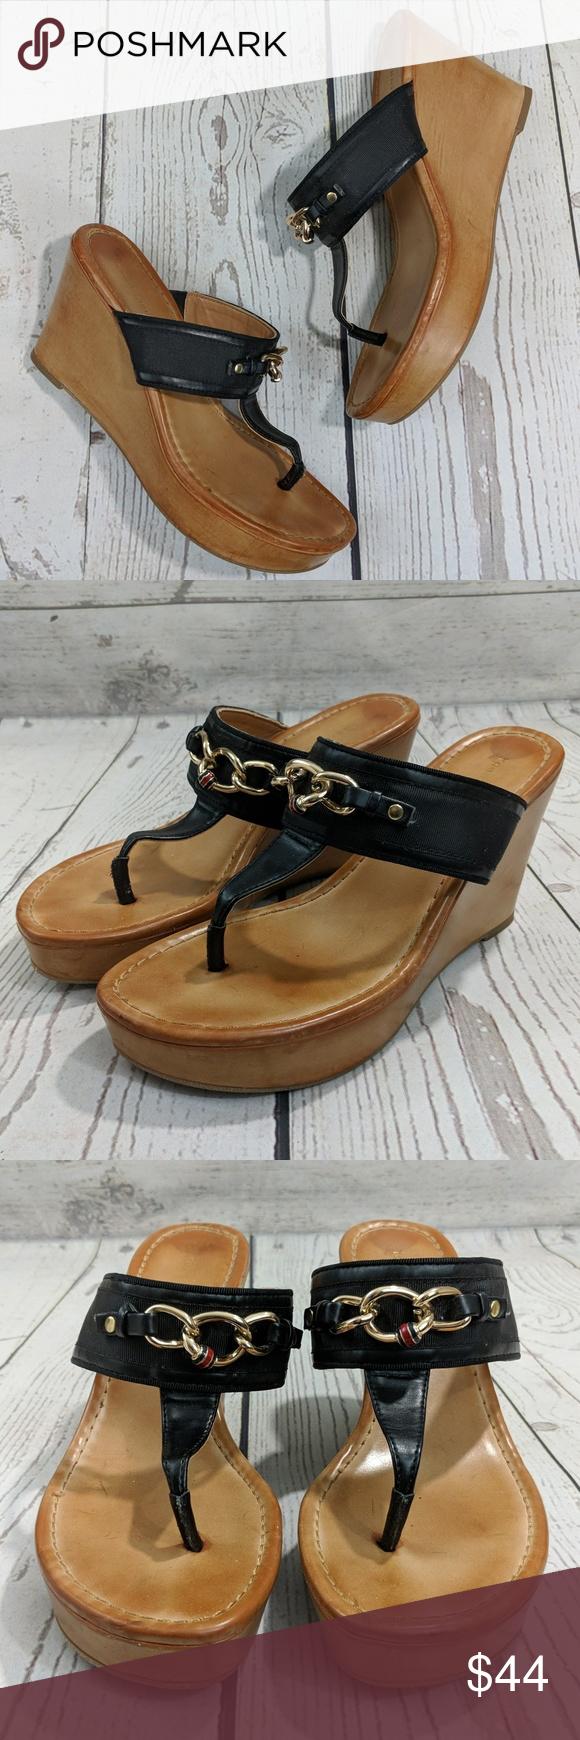 4f512d29b281b Tommy Hilfiger Wedge Sandals in Black